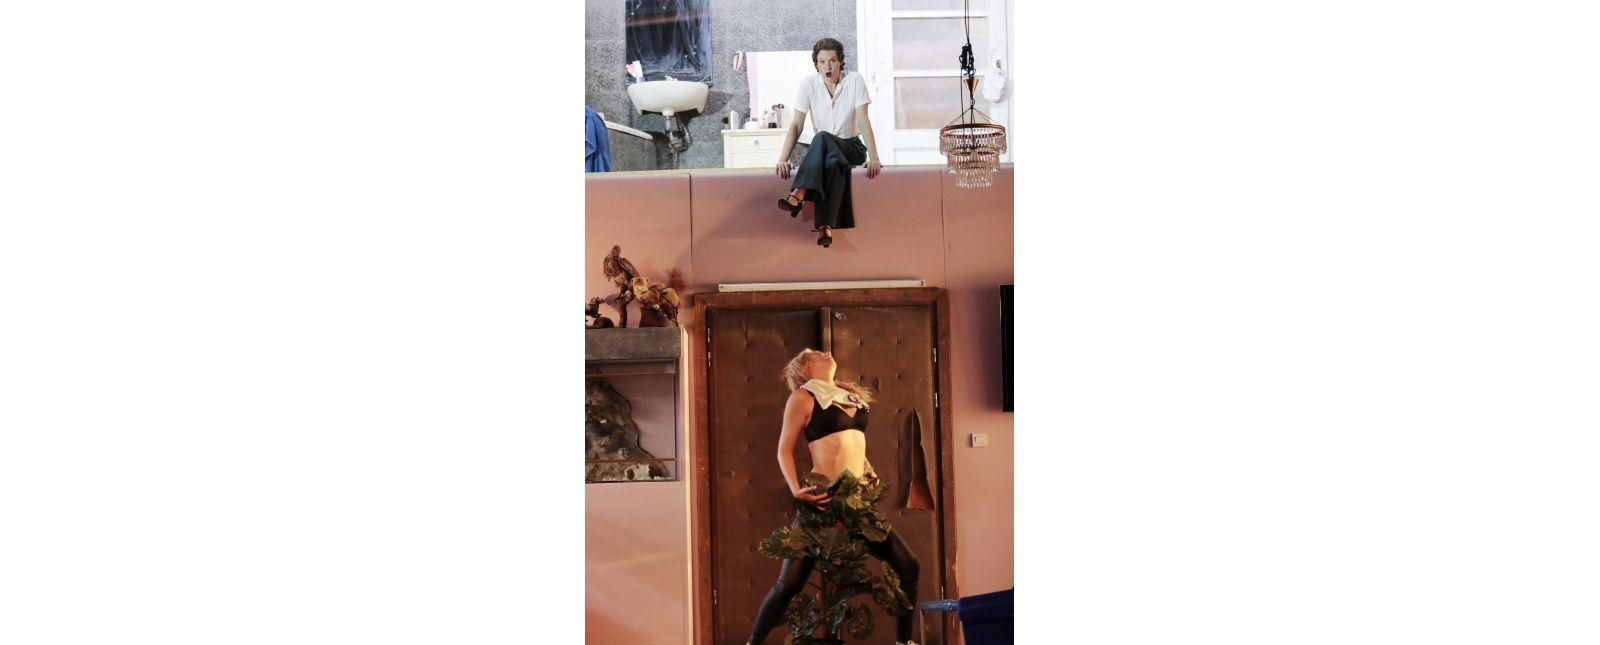 DIE 7 TODSÜNDEN & MOTHERLAND // Inga Schäfer / Nora Buzalka // 2020 // Paul Leclaire